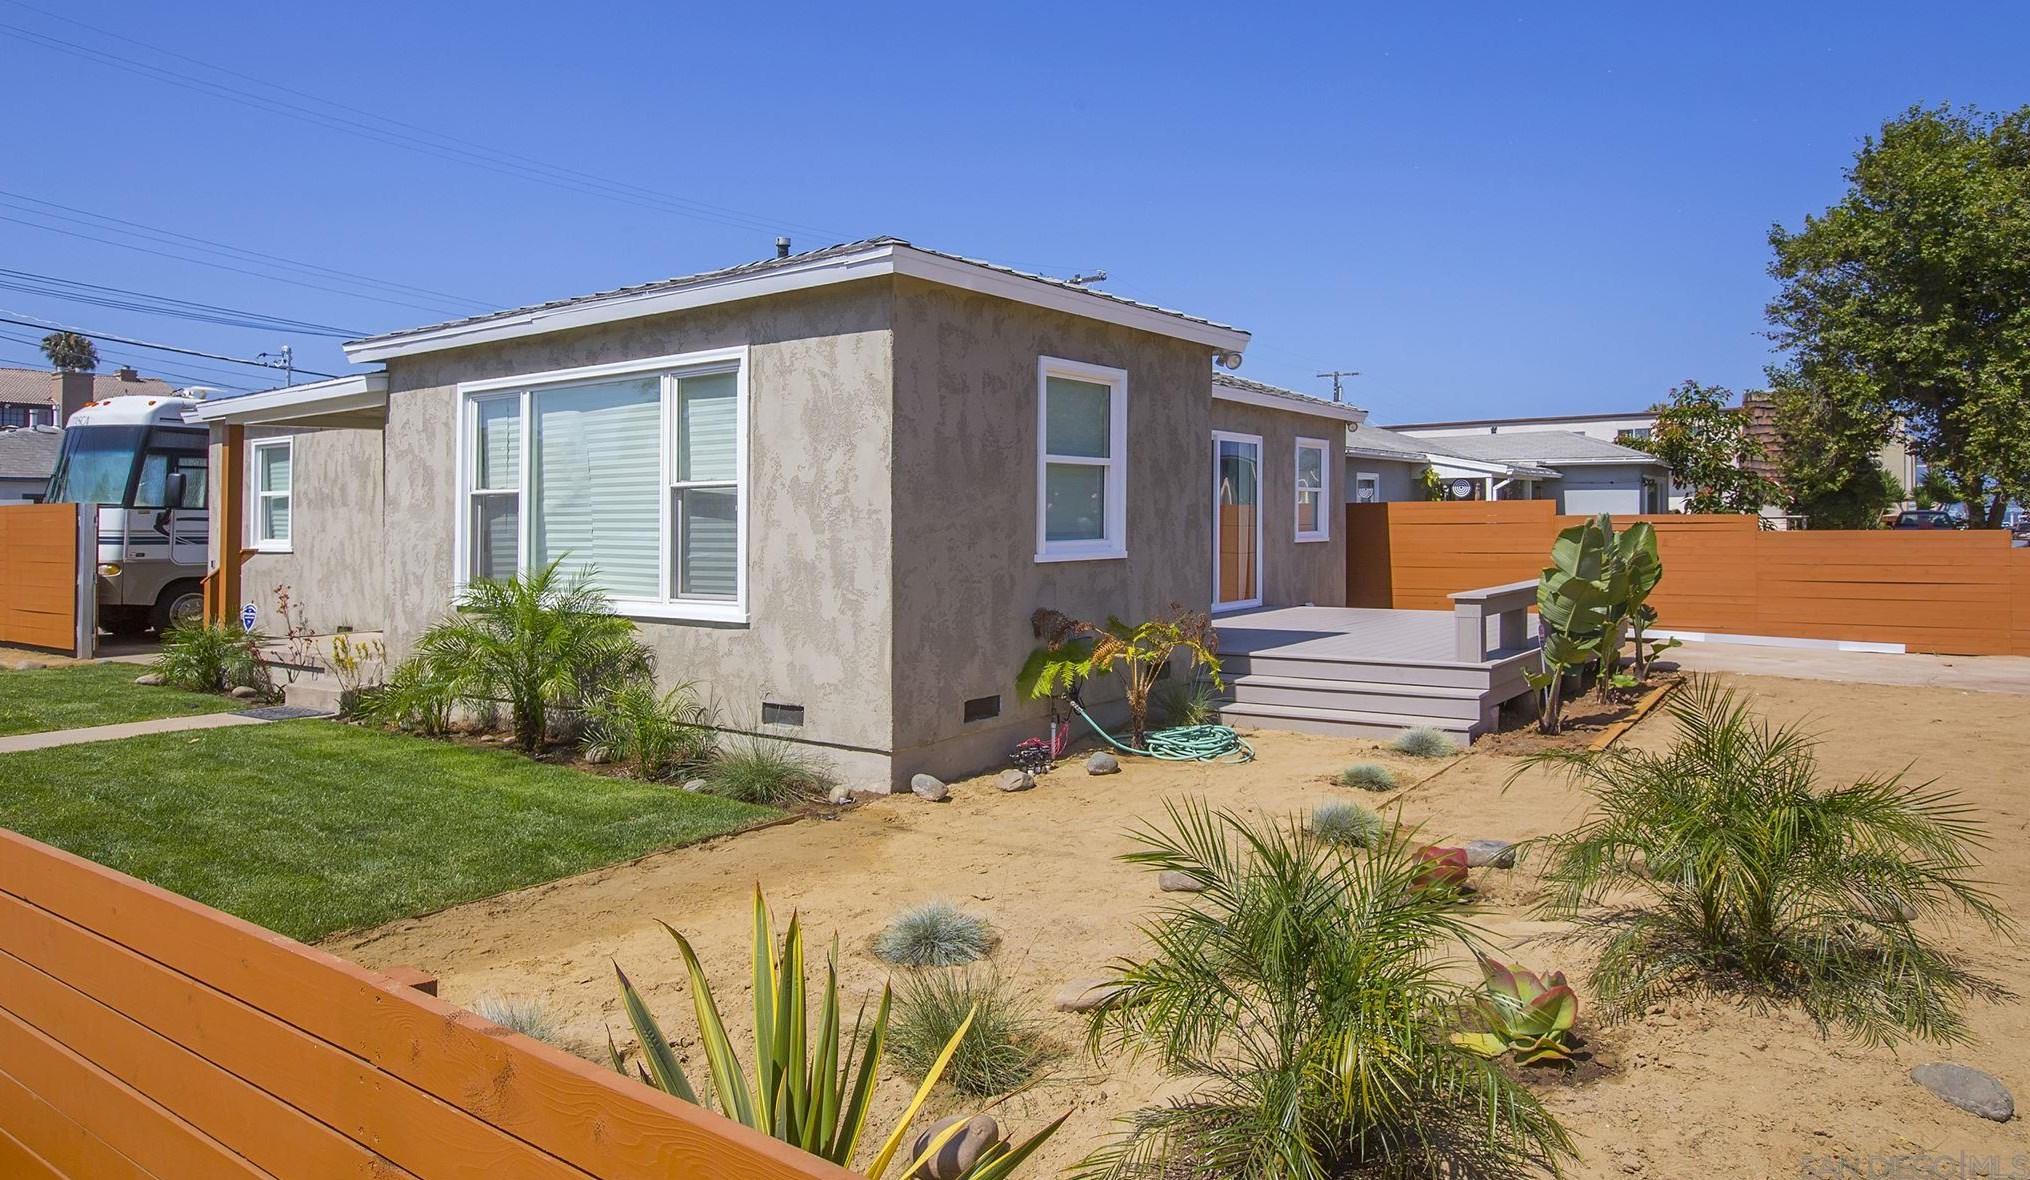 806 2nd St, Imperial Beach, CA 91932